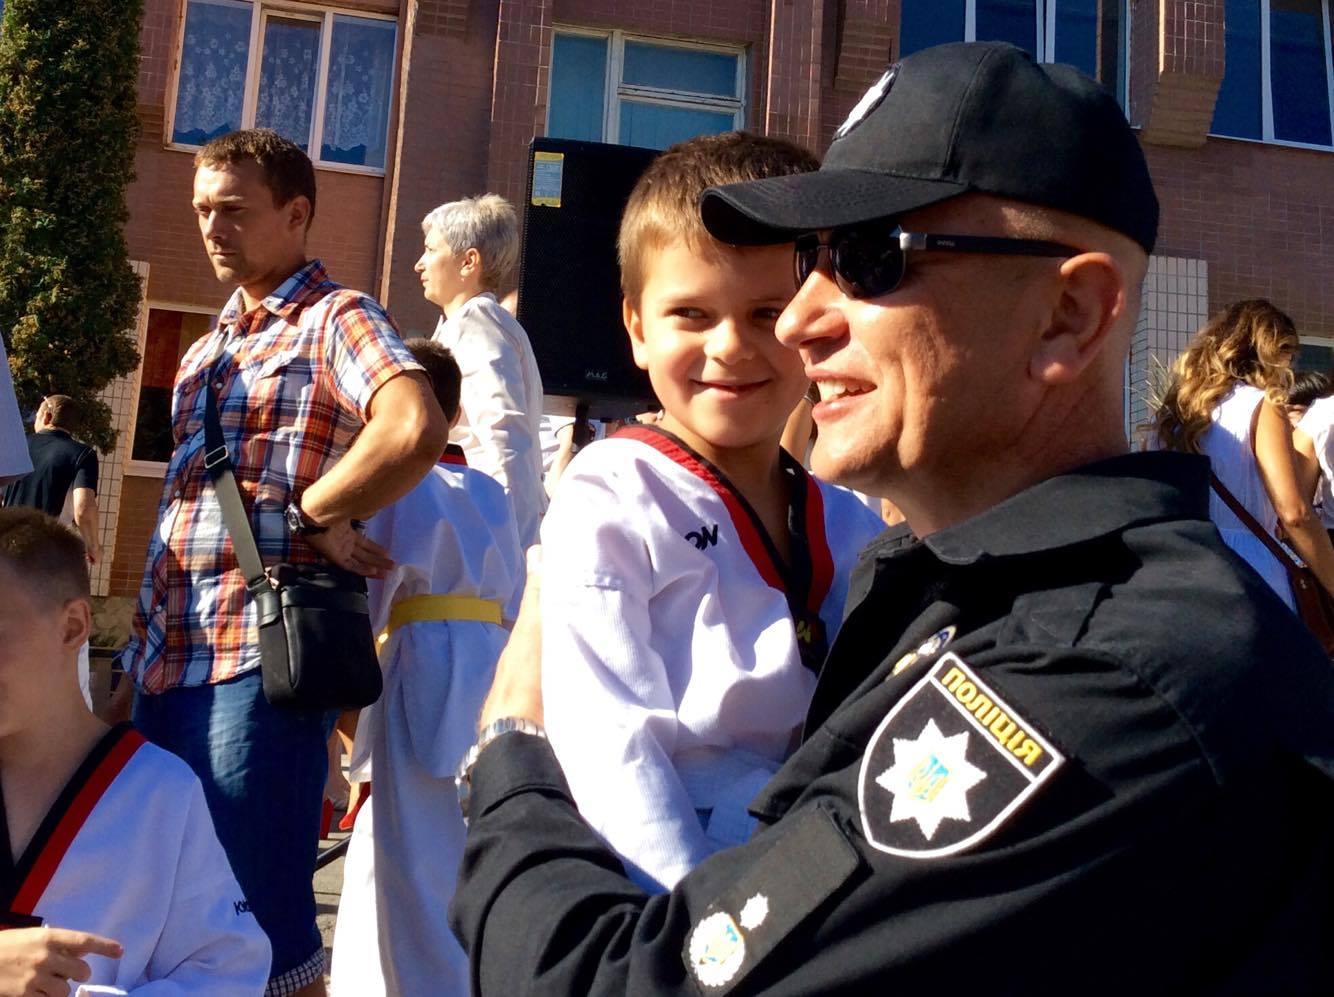 Хмельницький НВК№10 на Першовересень заполонили поліцейські - фото 16